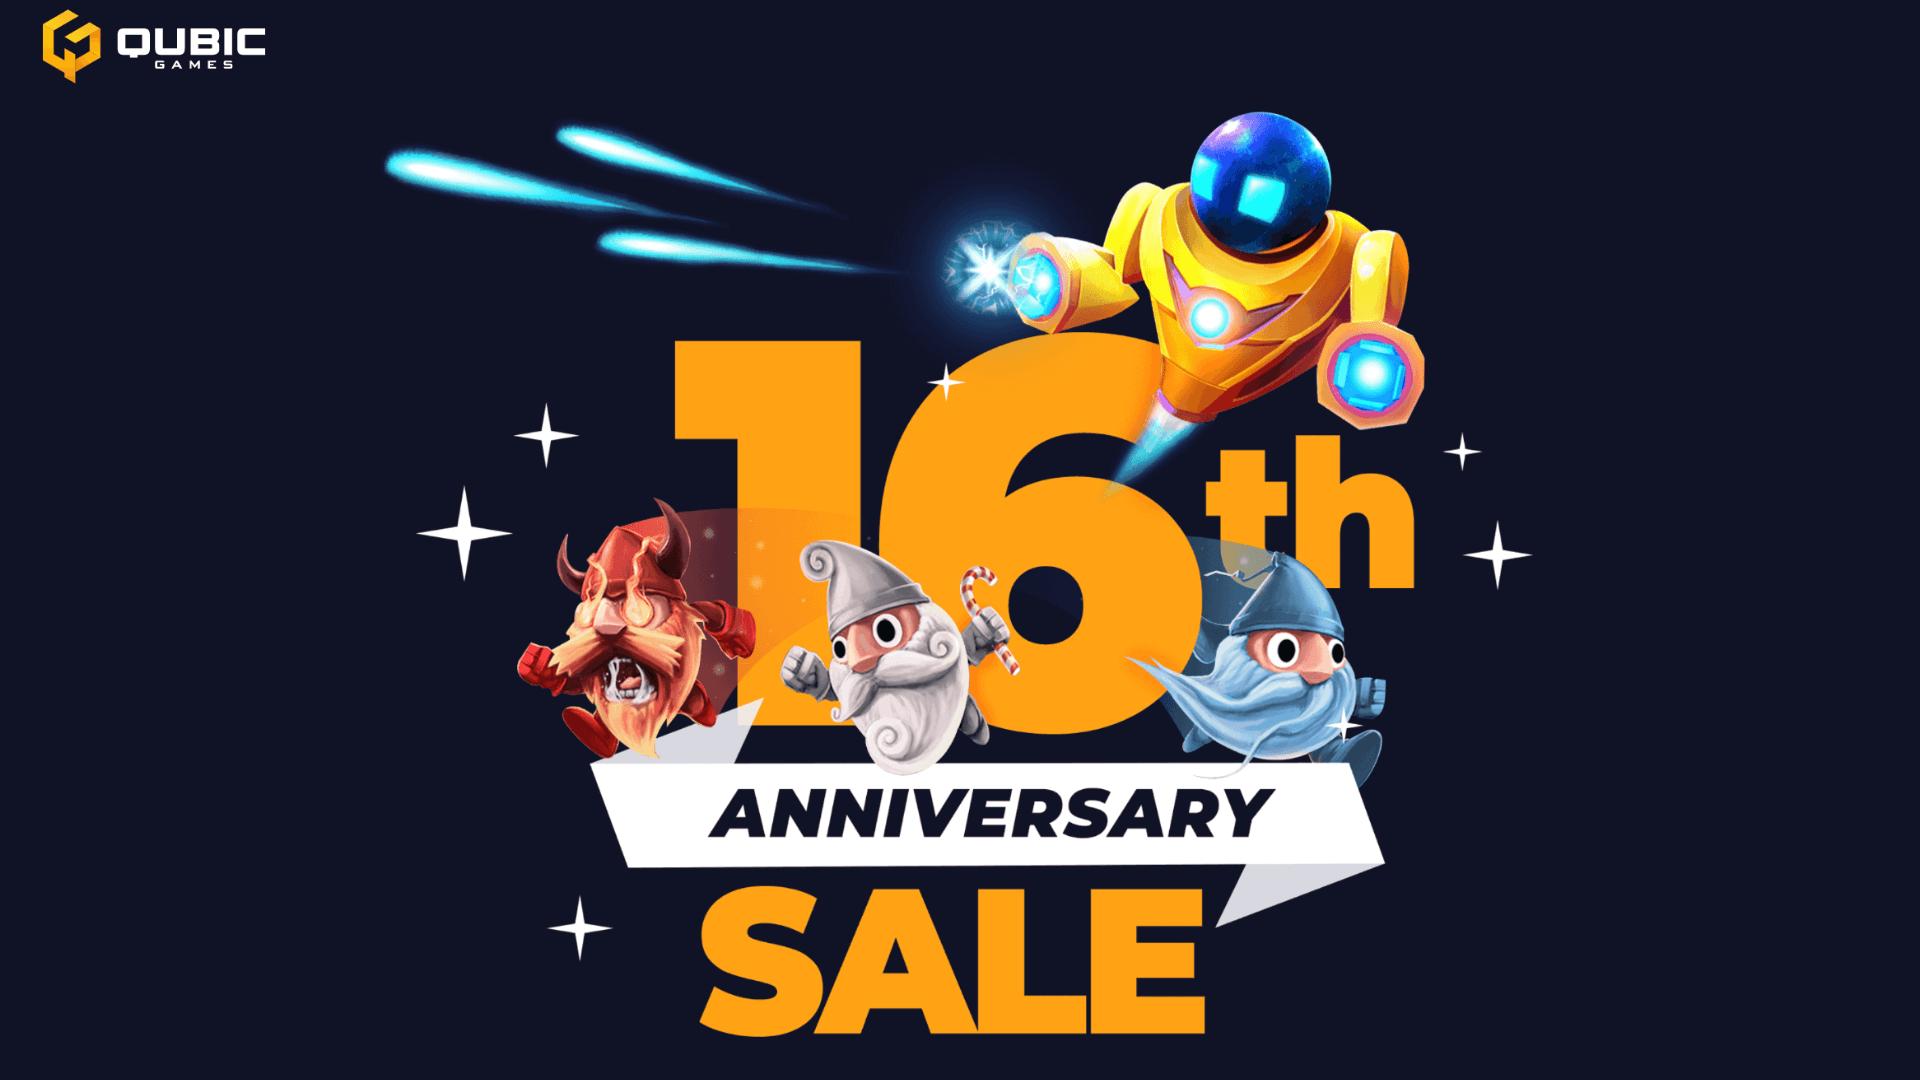 Qubic Games' Anniversary Sale